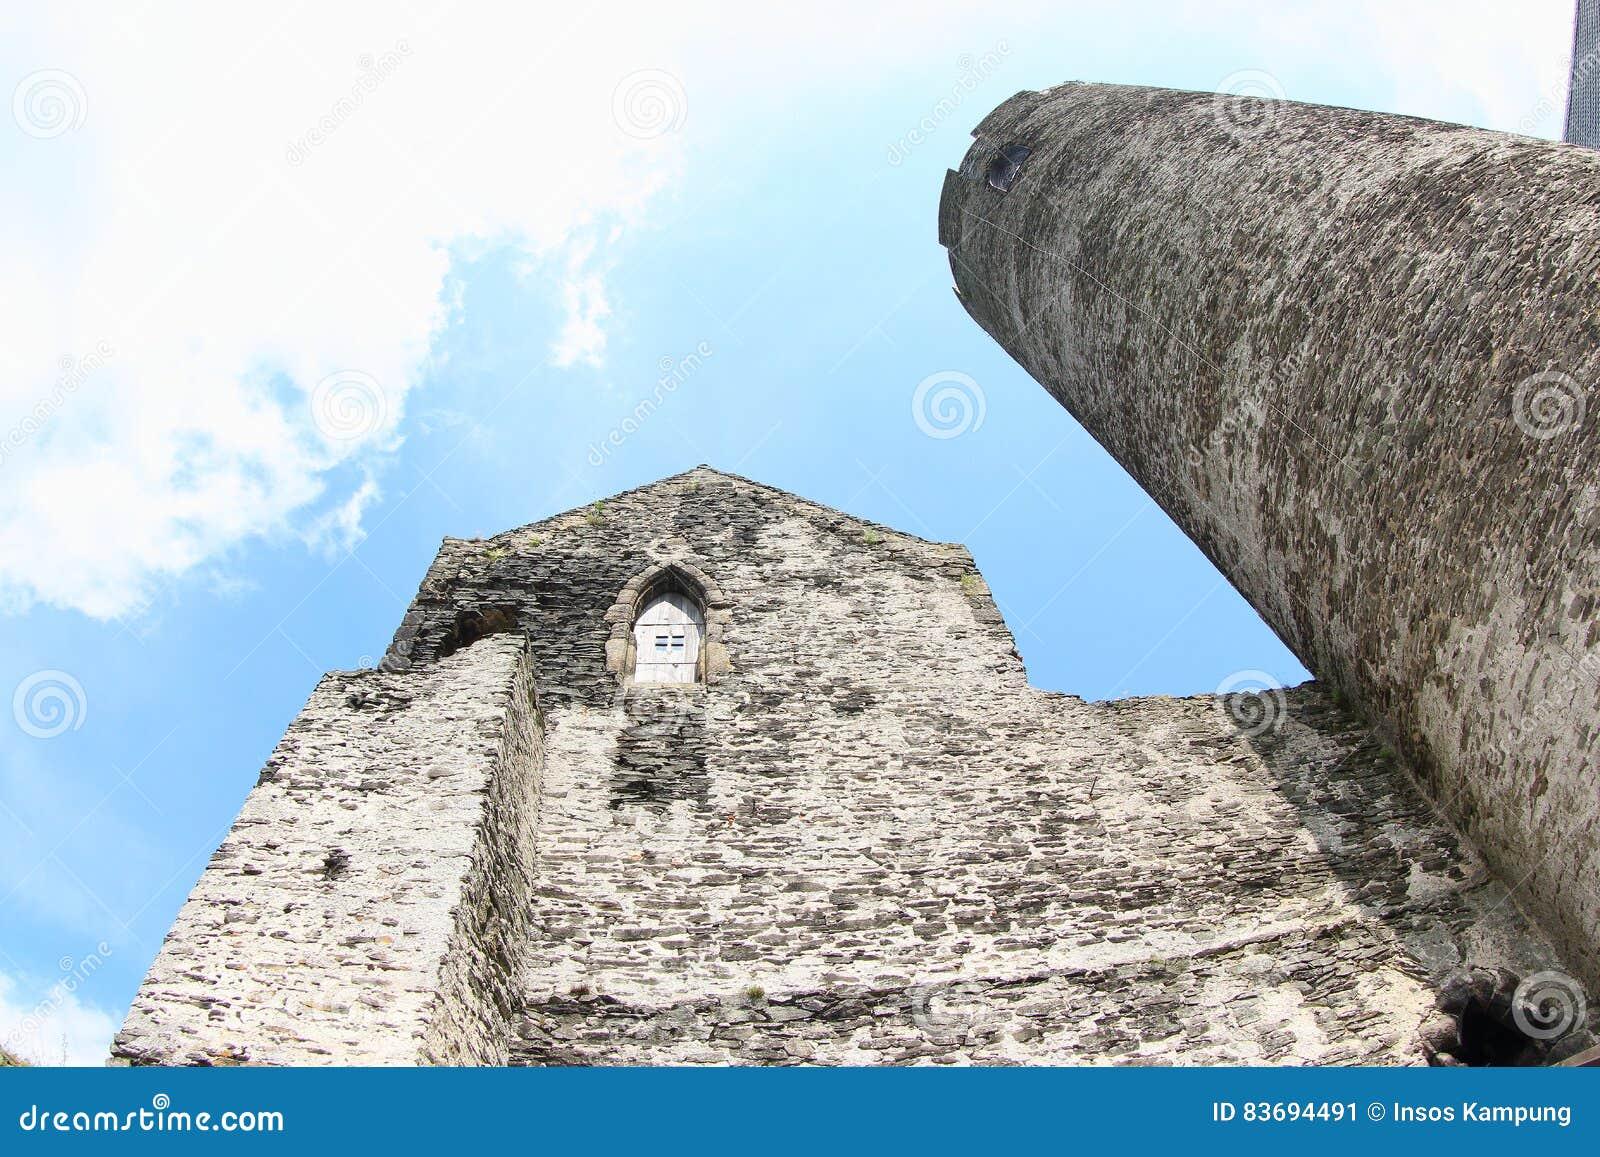 Bezdez Castle